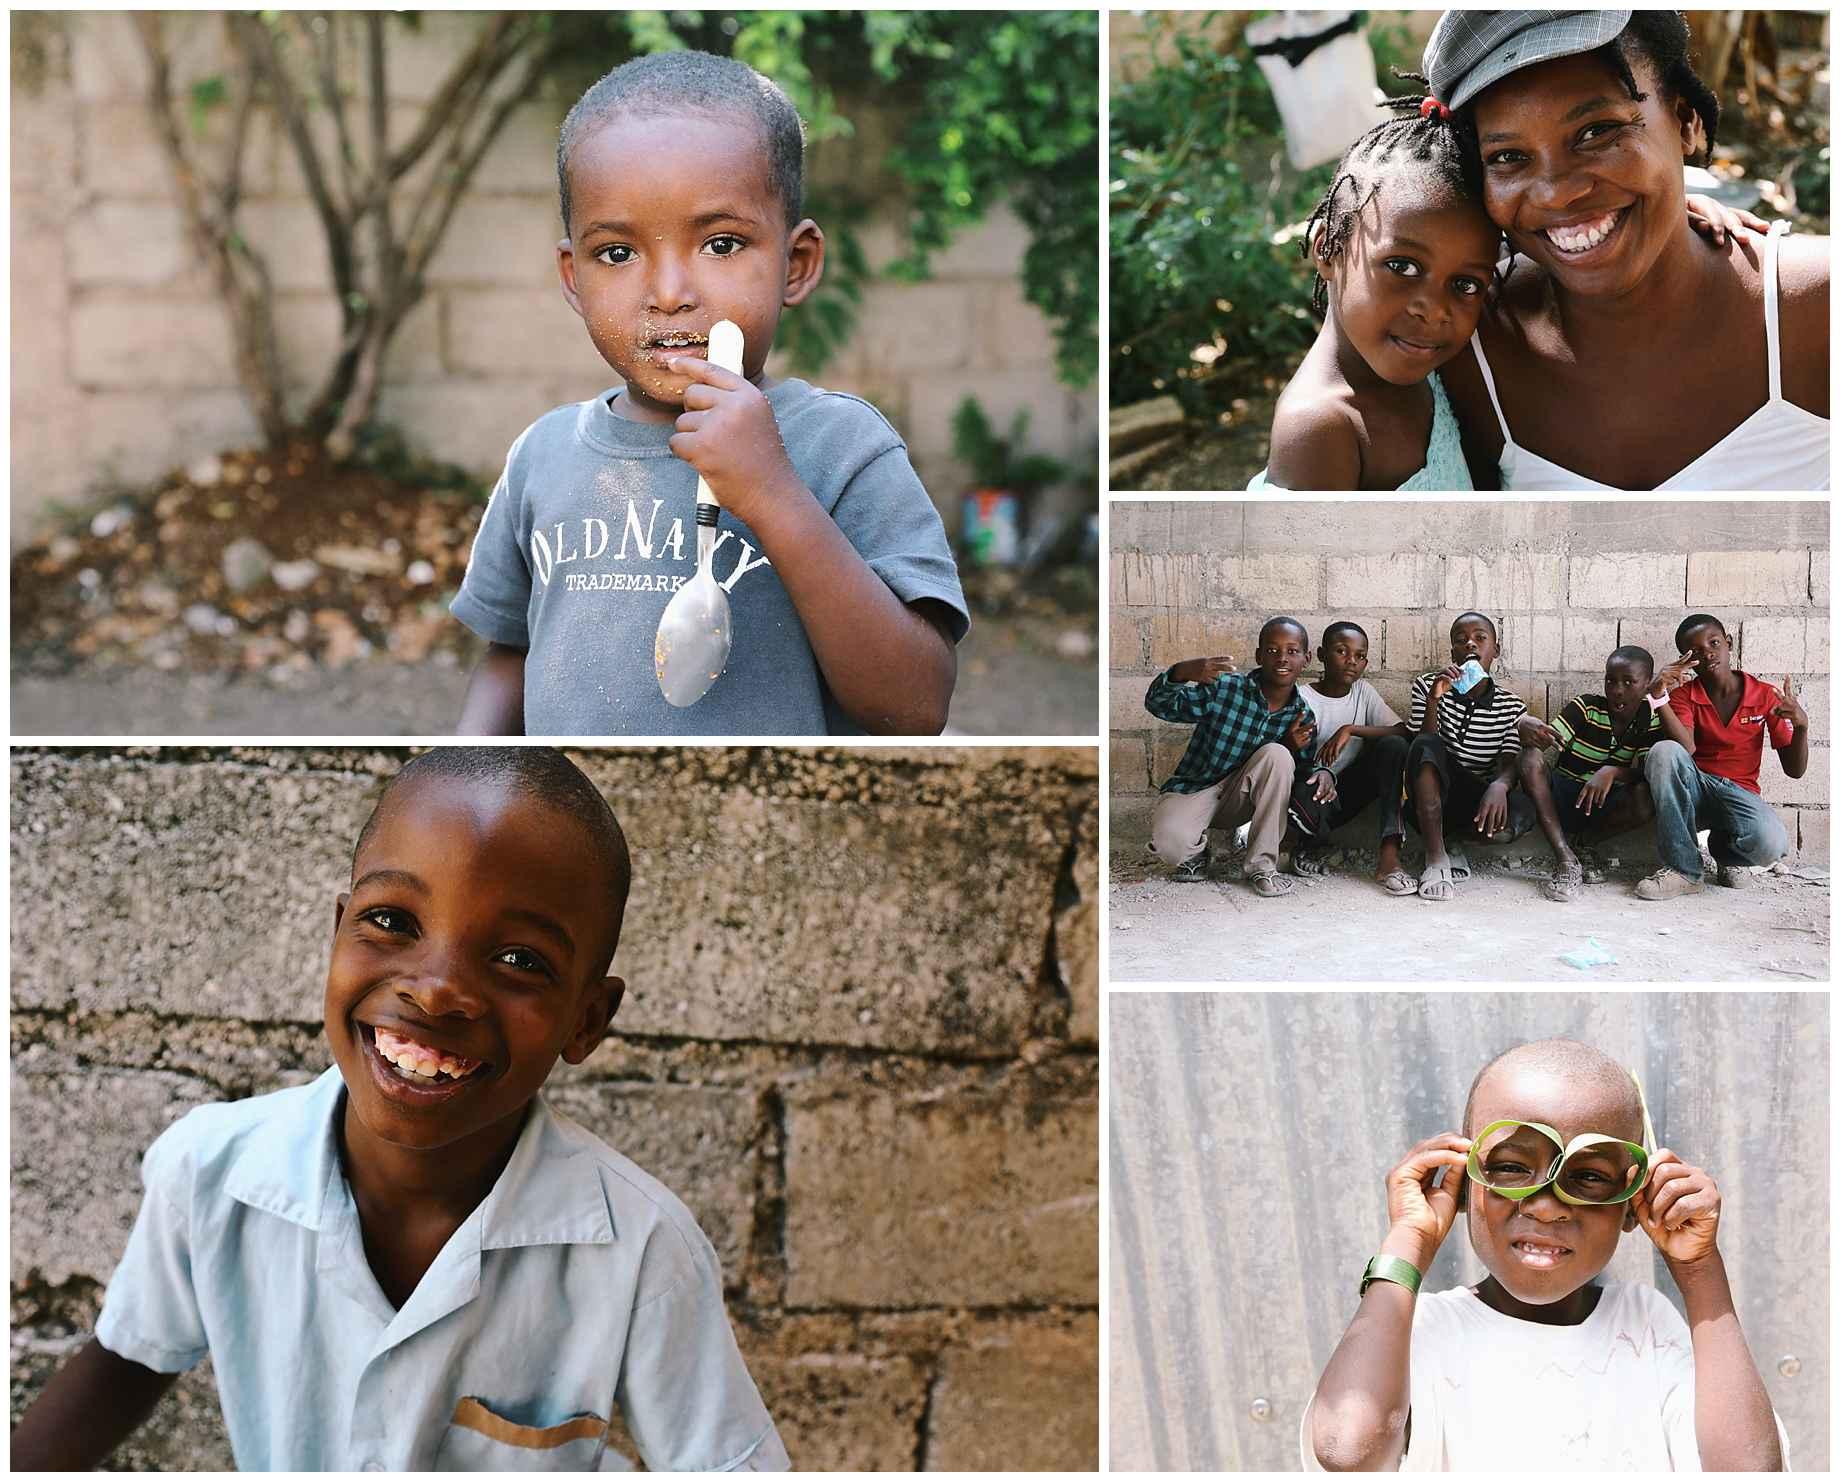 haiti-photography-08